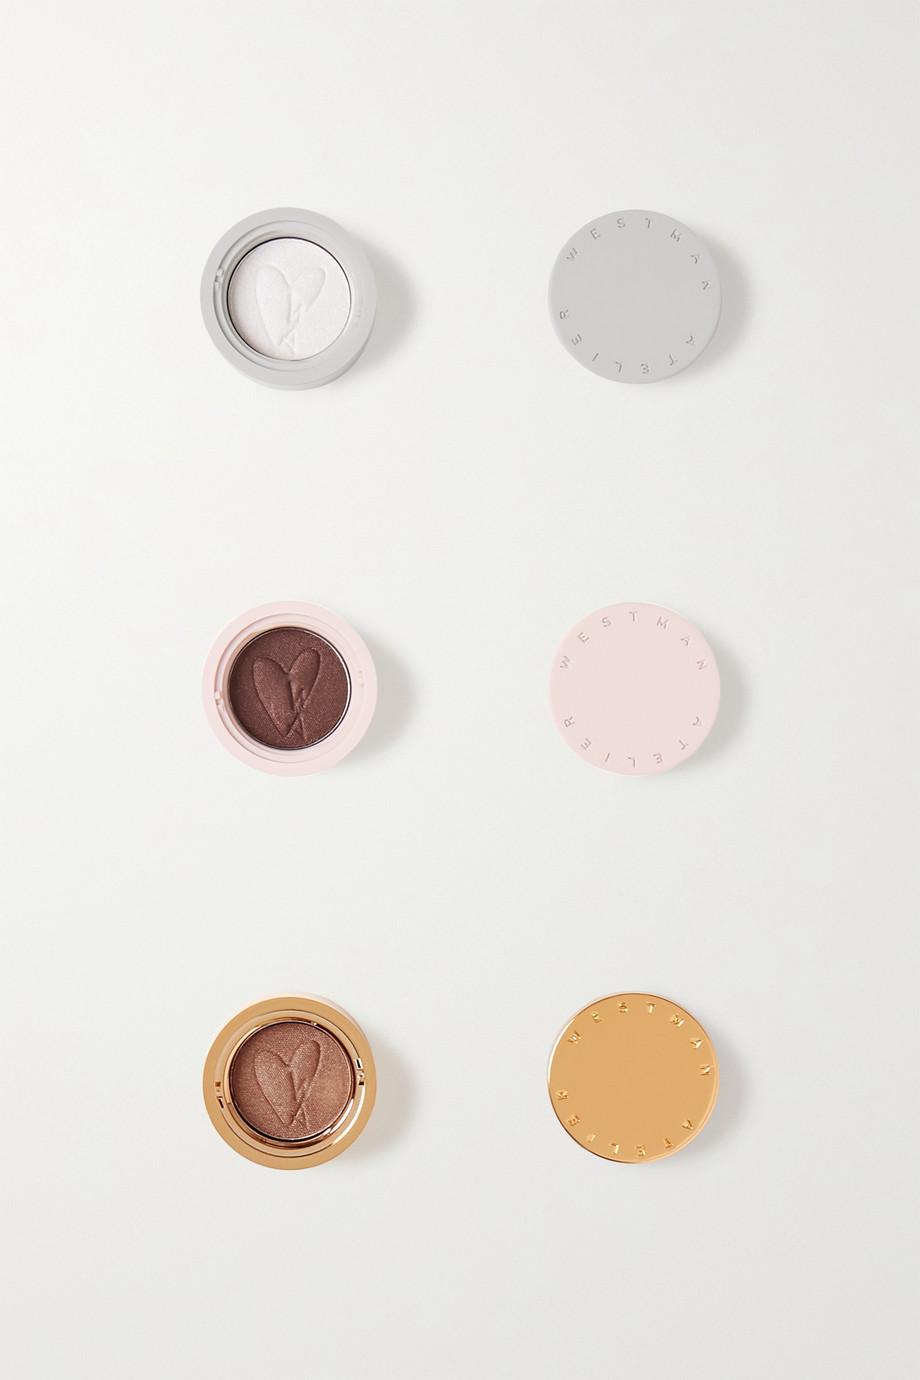 Westman Atelier Eye Pods – Neige, Chocolat, Tabac – Set aus drei Lidschatten